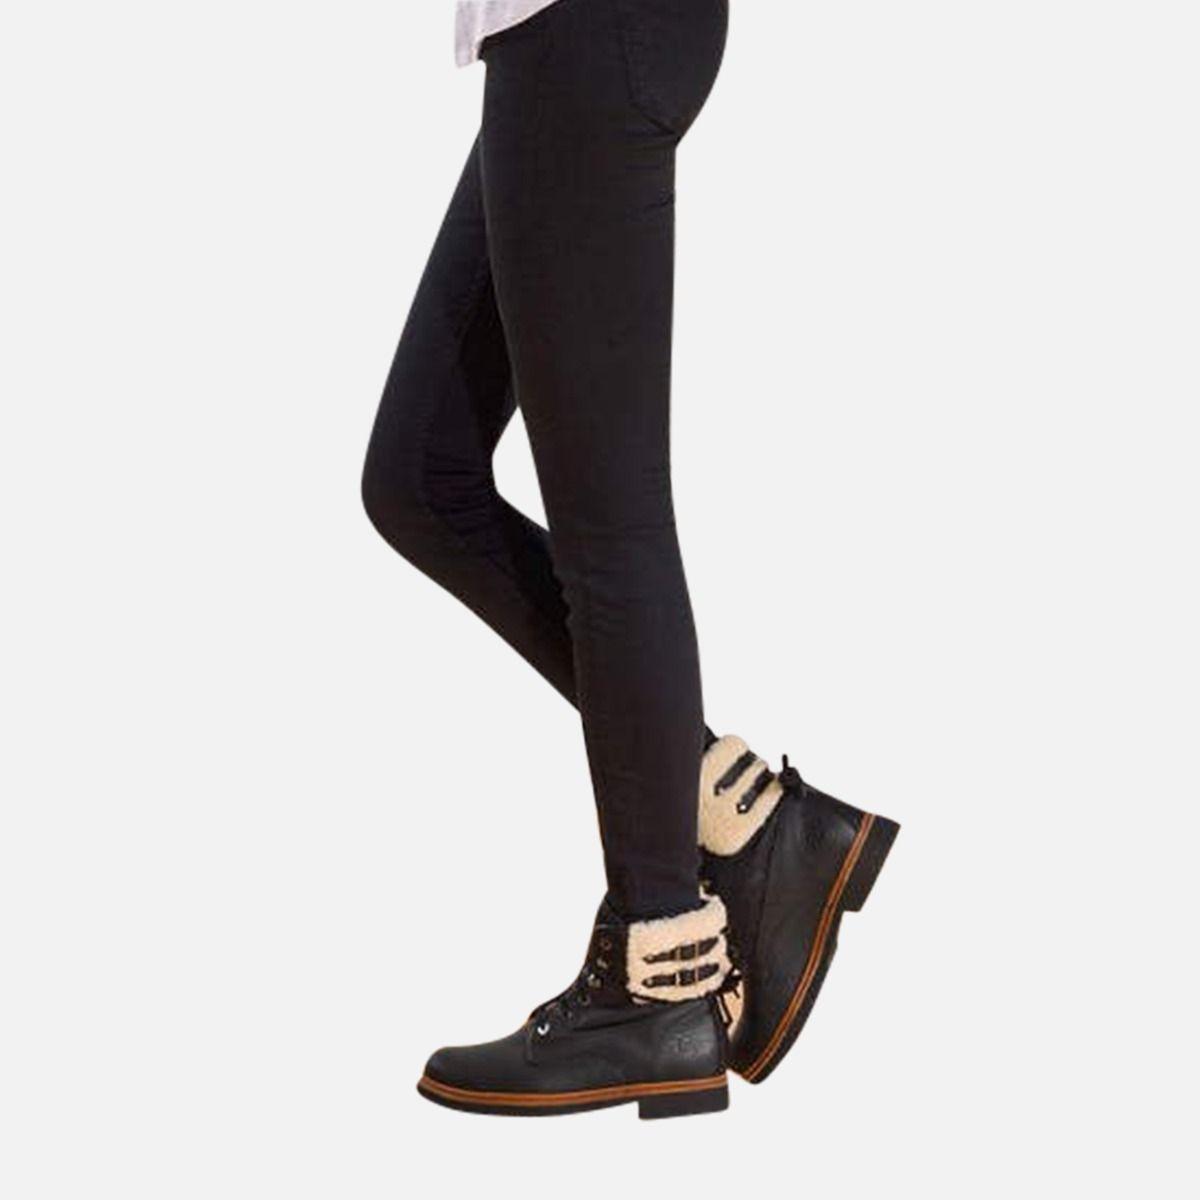 Ladies Black Panama Jack General Aviator Cotton Lined Fur Boots